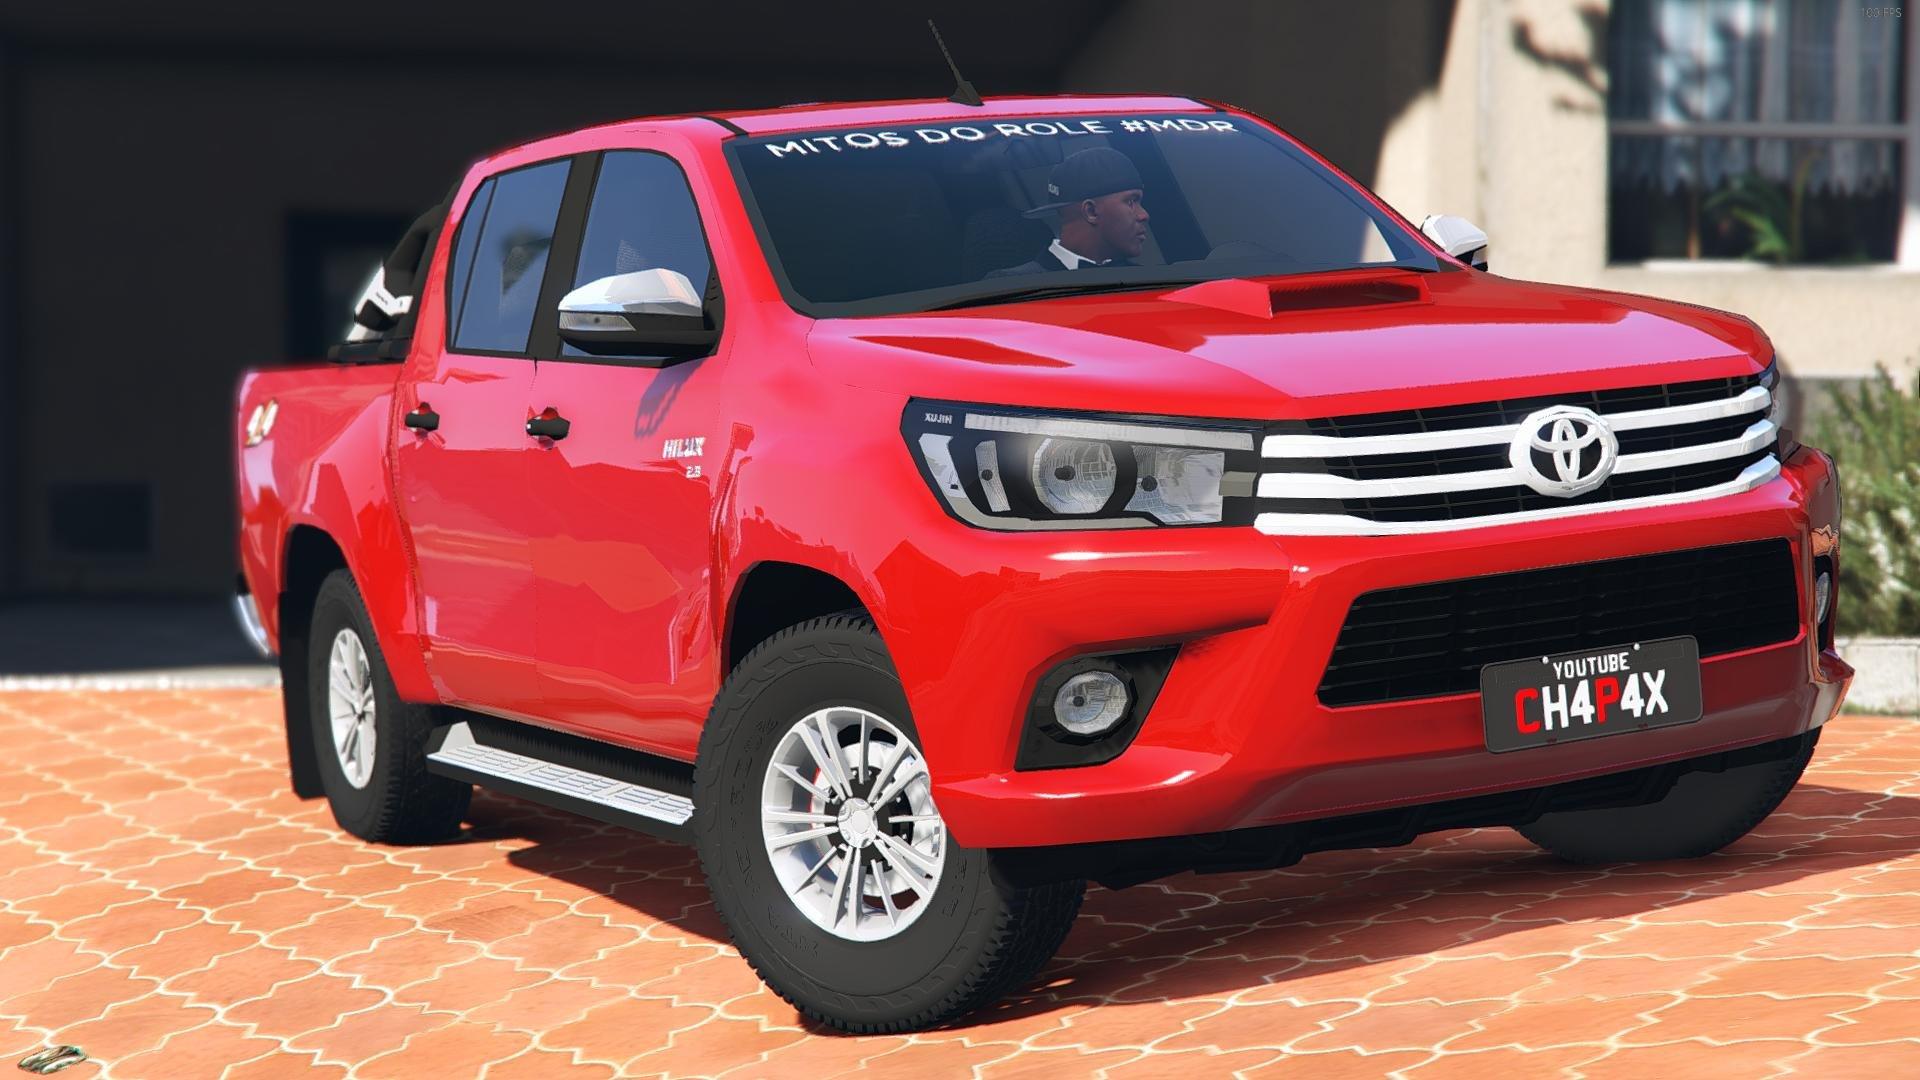 58c6f2-GTA5%202017-01-19%2012-07-23-92.j